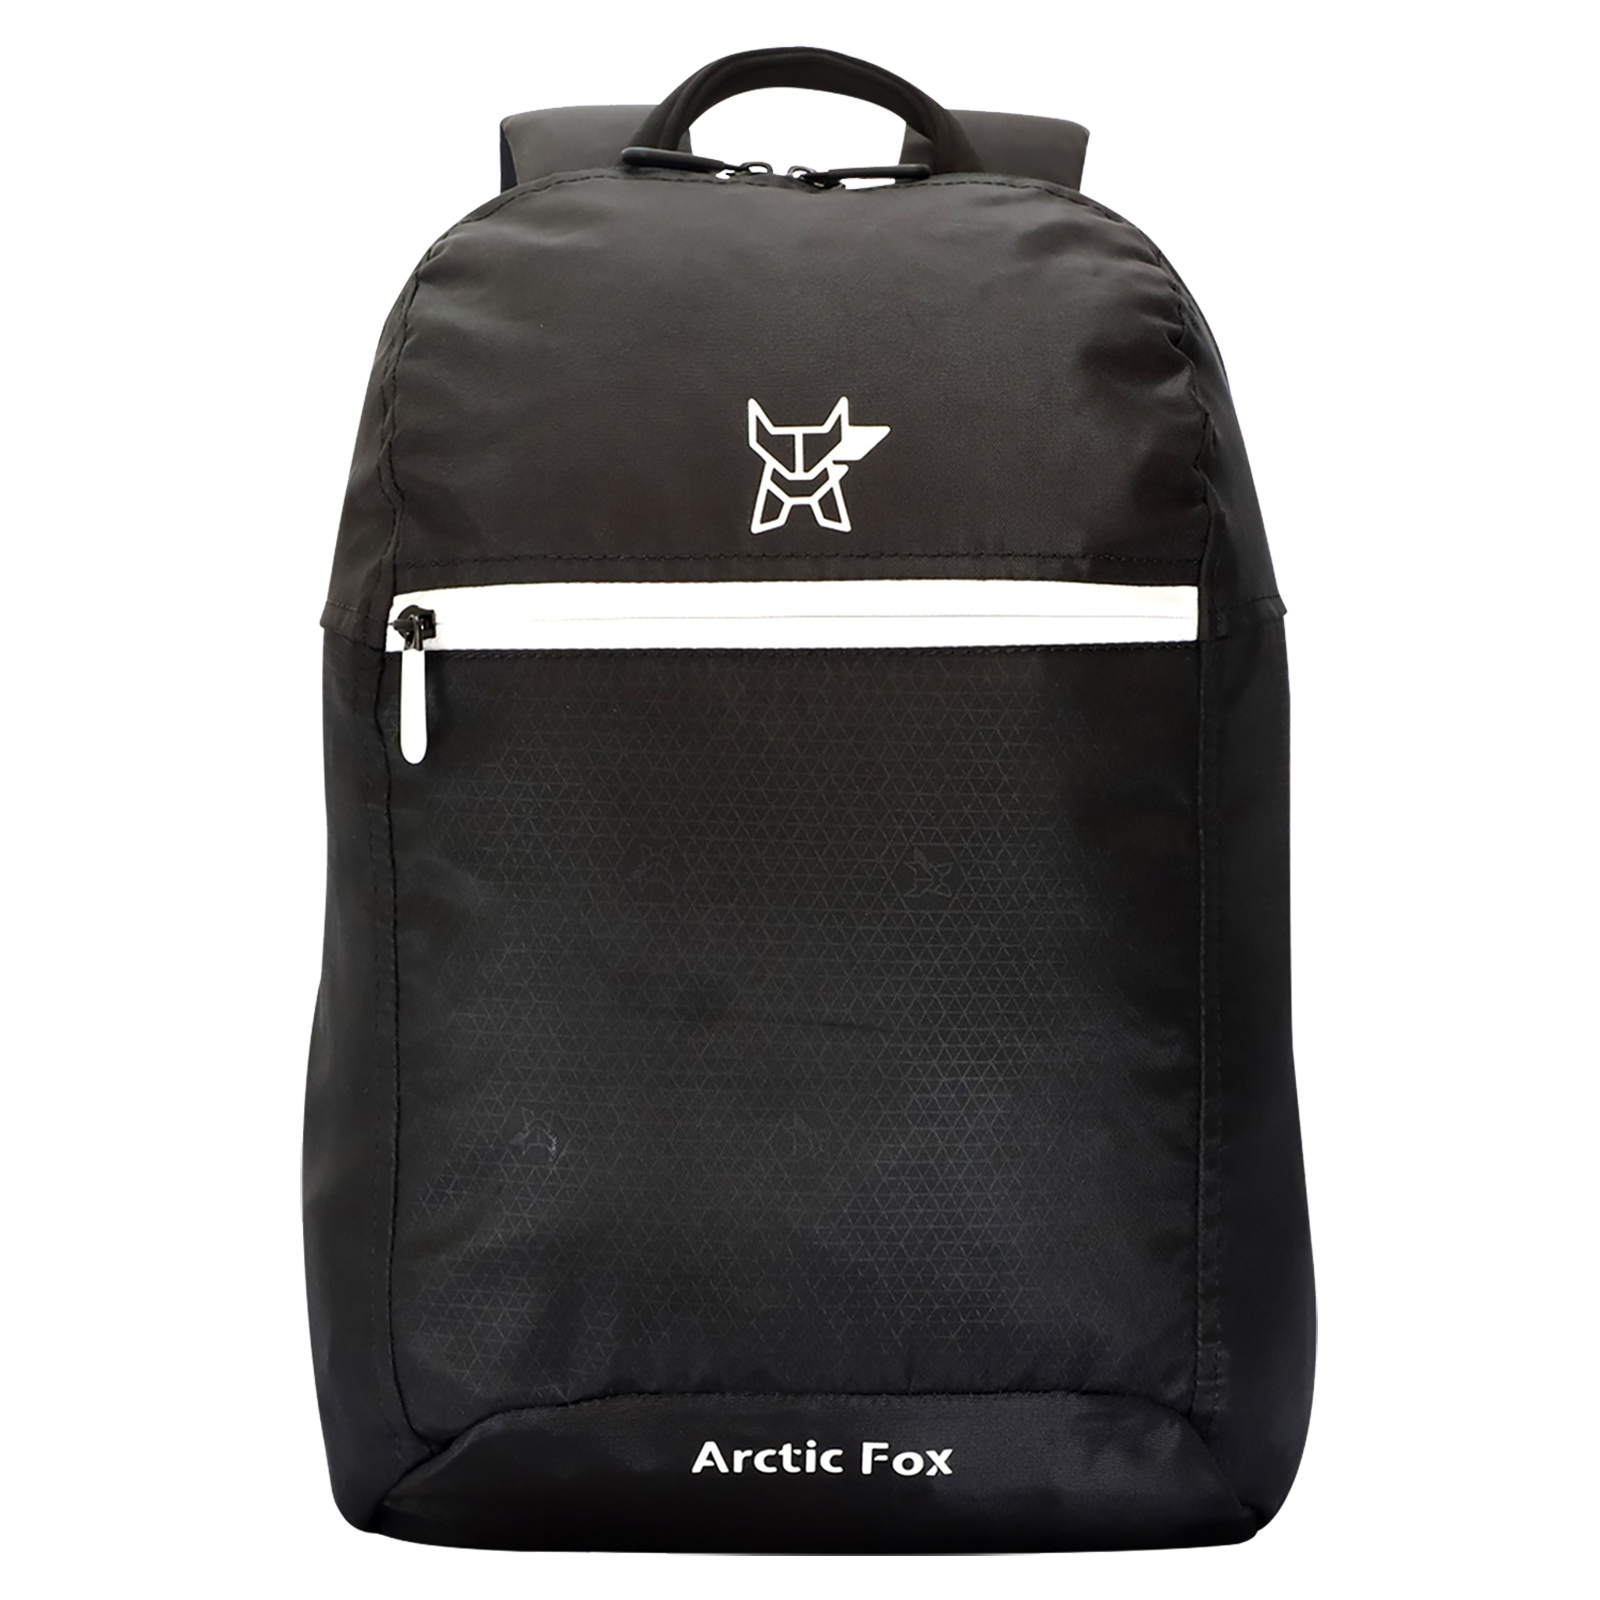 Arctic Fox Tuition 17 Litres PU Coated Polyester Backpack (FMIBPKBLKON003017, Black)_1